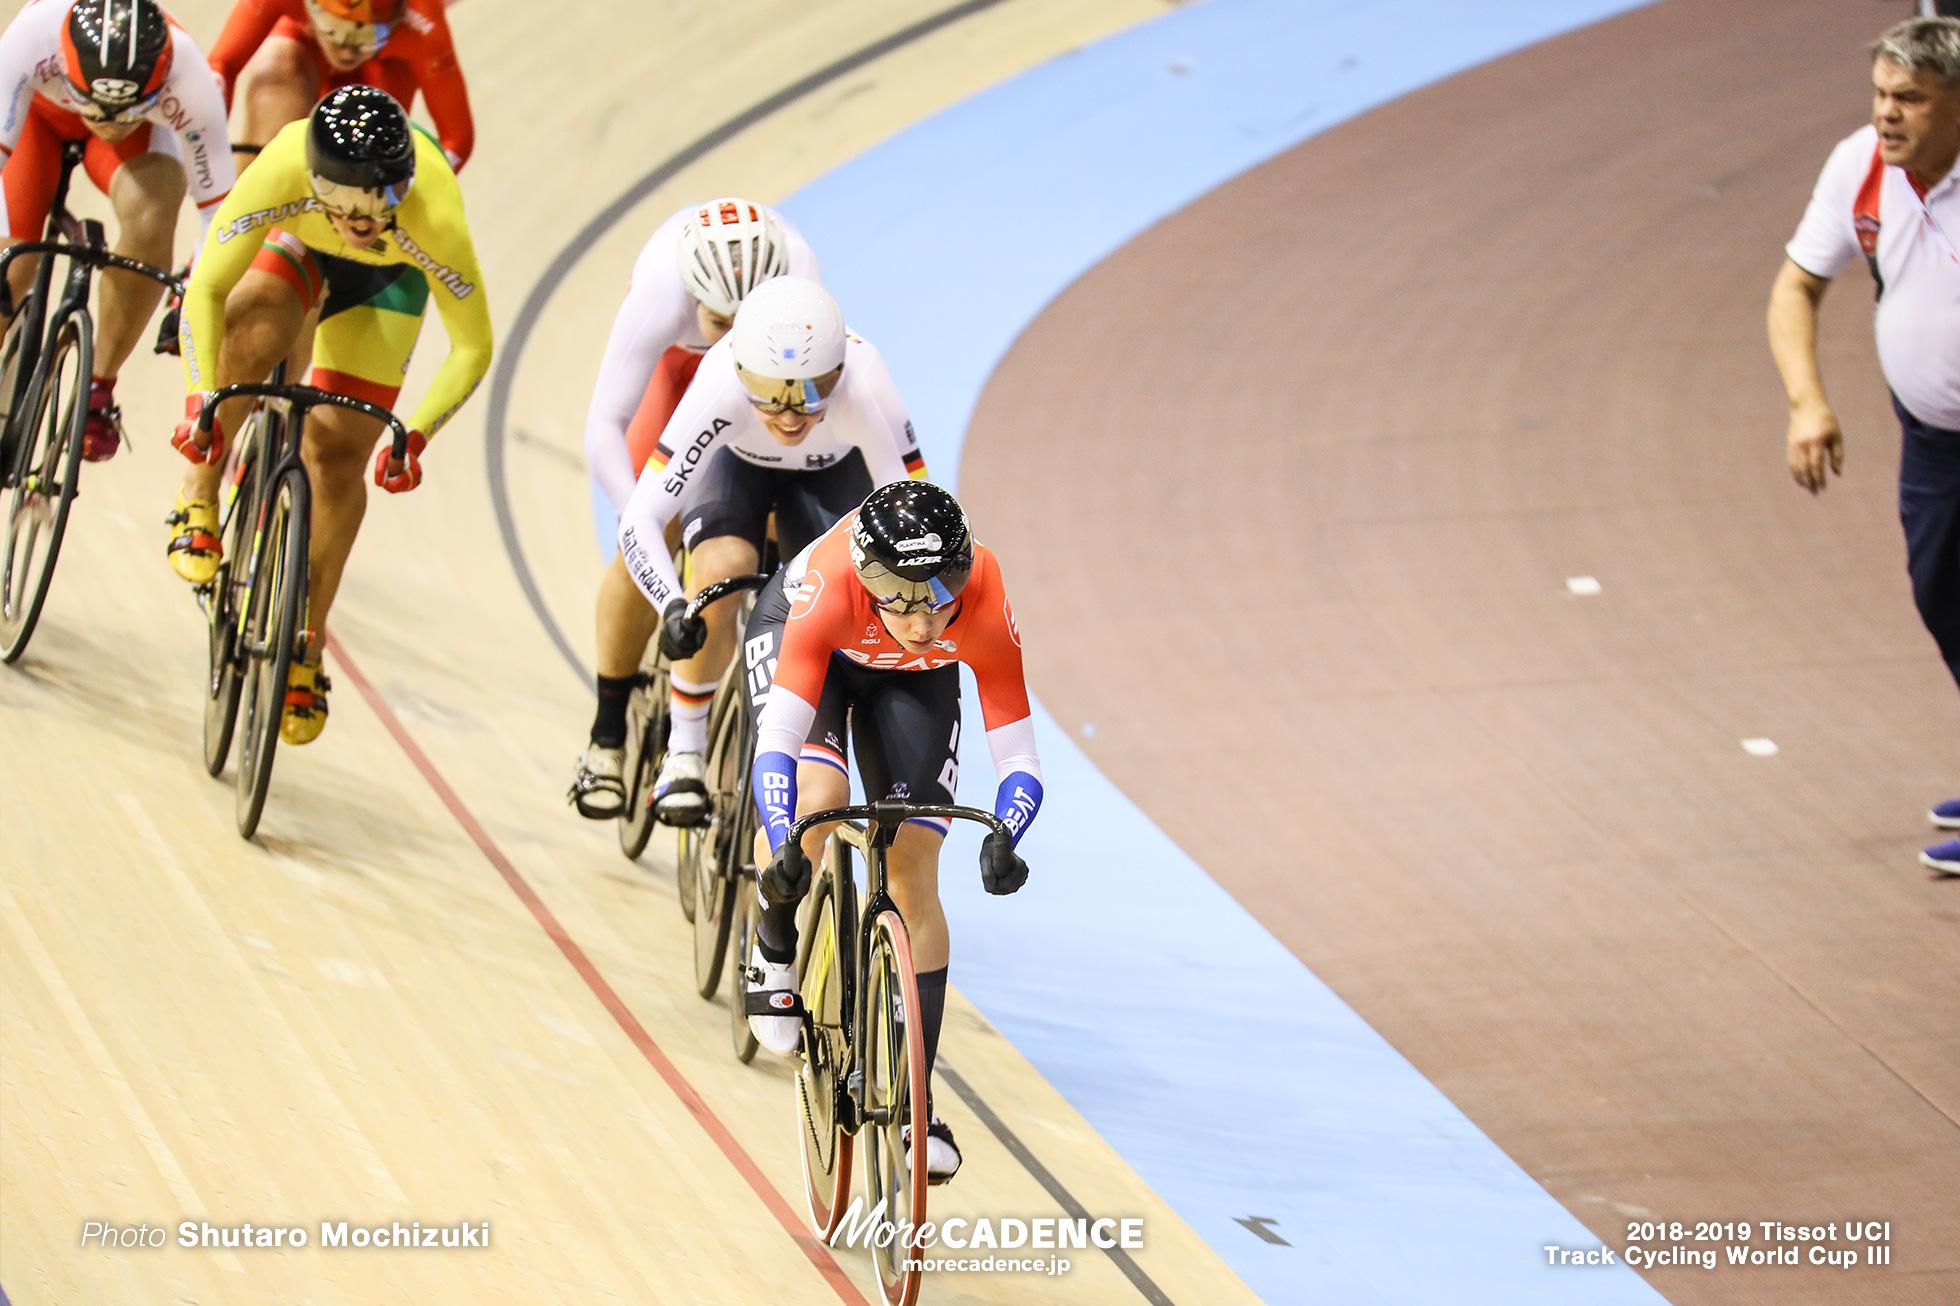 Women's Keirin 2nd Round/2018-2019 Track Cycling World Cup III Berlin